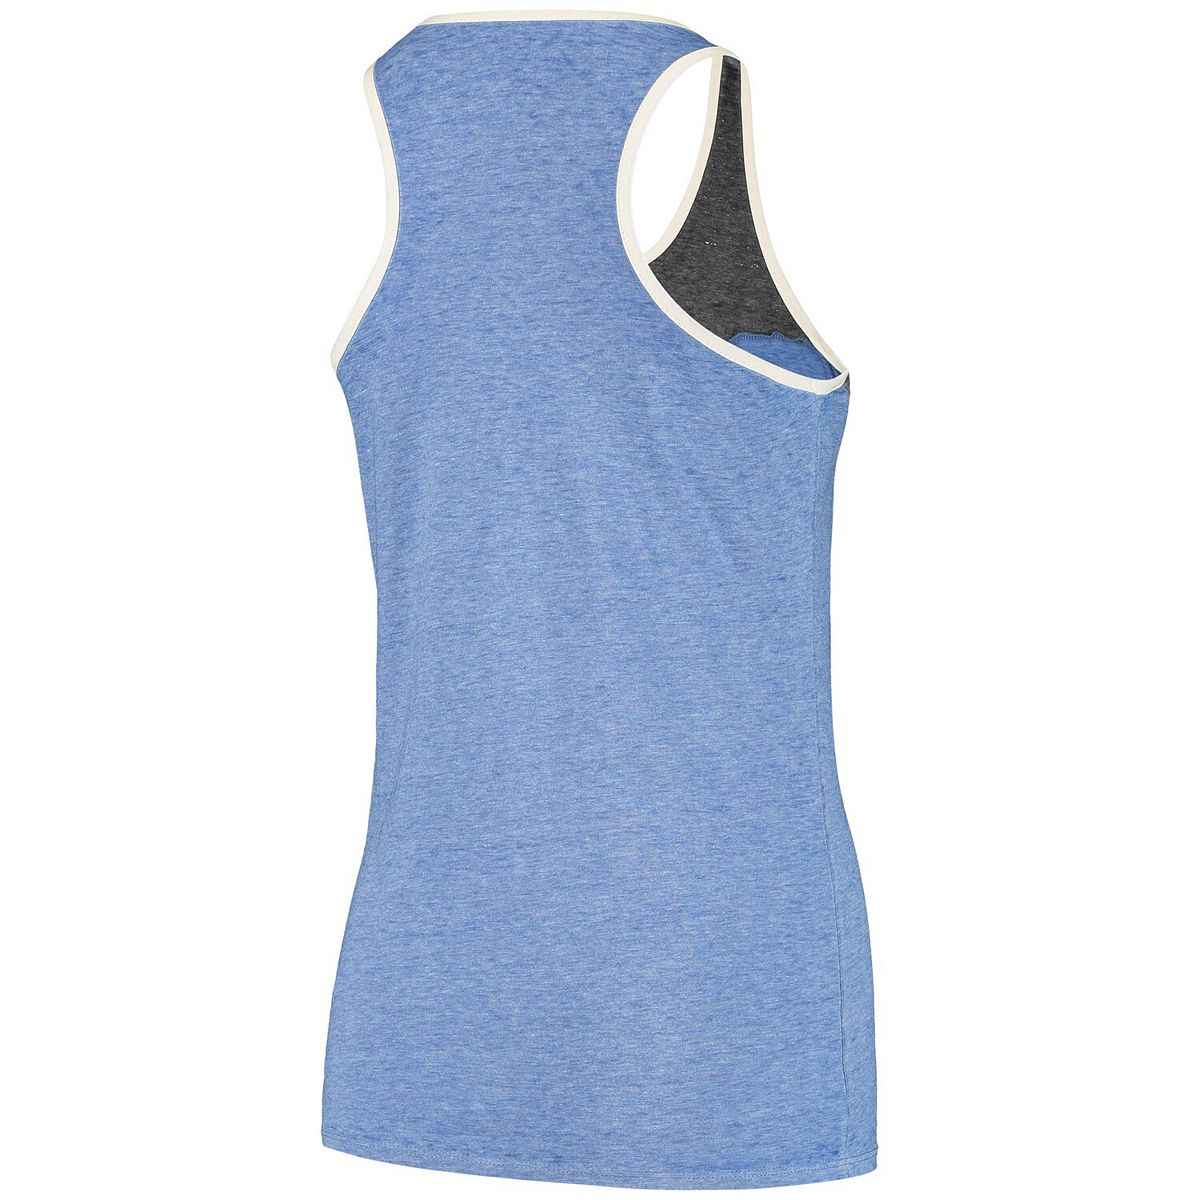 Women's Concepts Sport Royal New York Giants Loyalty Tank Top & Shorts Sleep Set J6J07